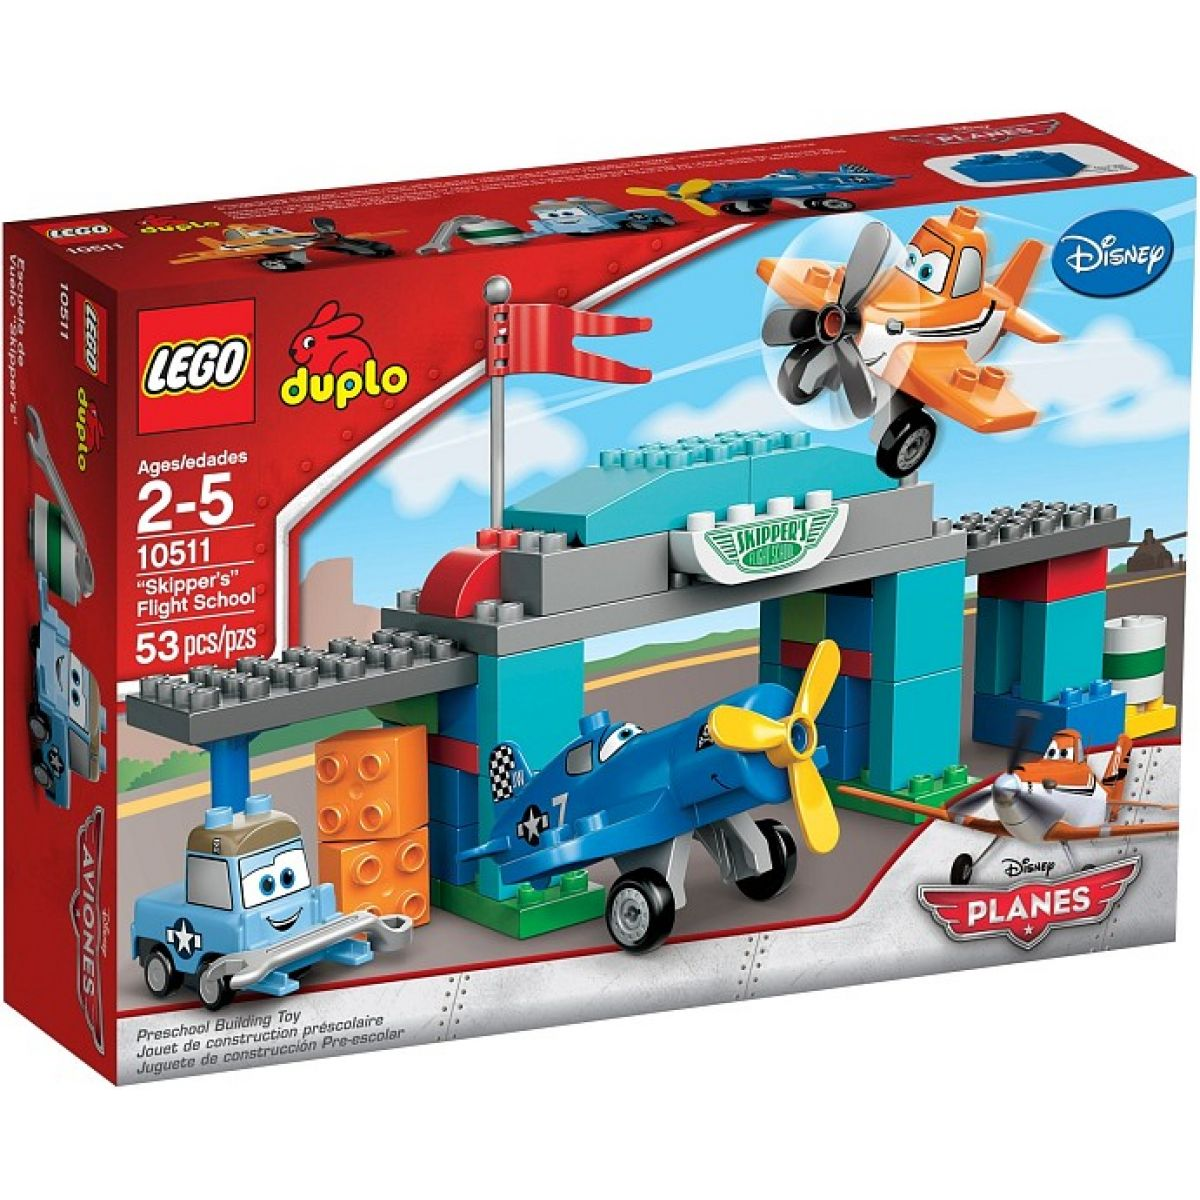 LEGO DUPLO 10511 Skipperova letecká škola